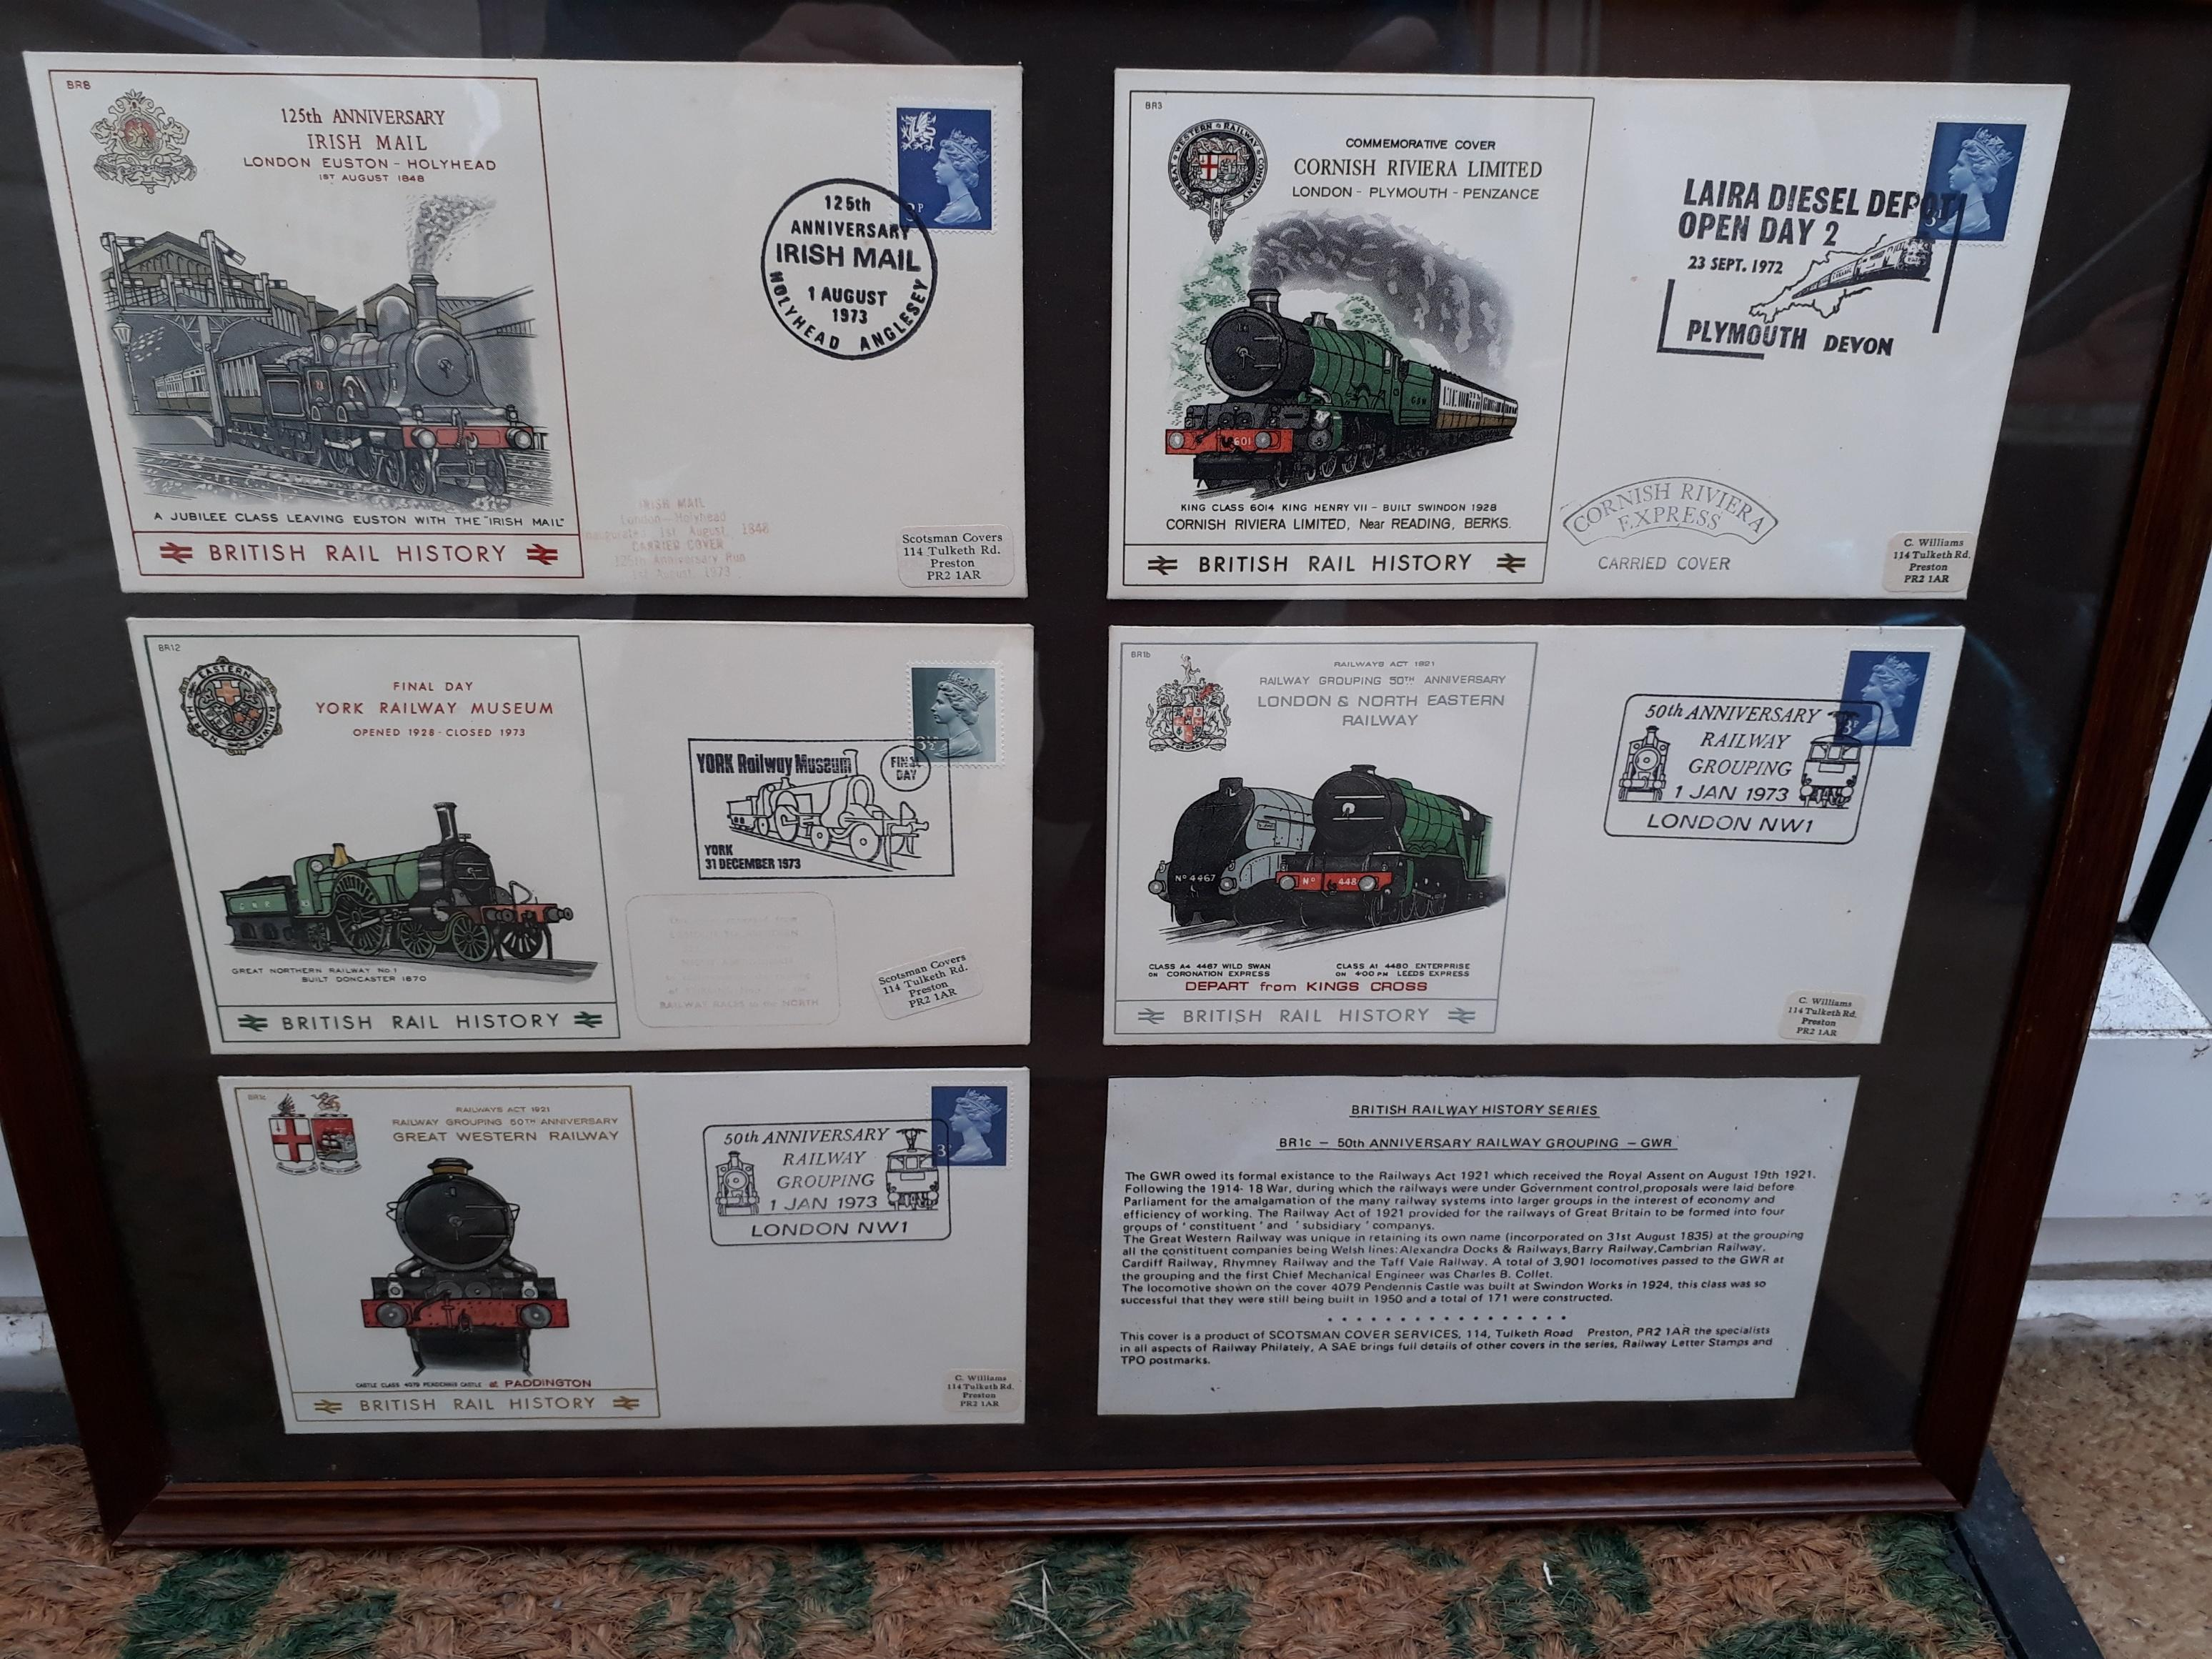 Railwayana - Royal Mail Covers